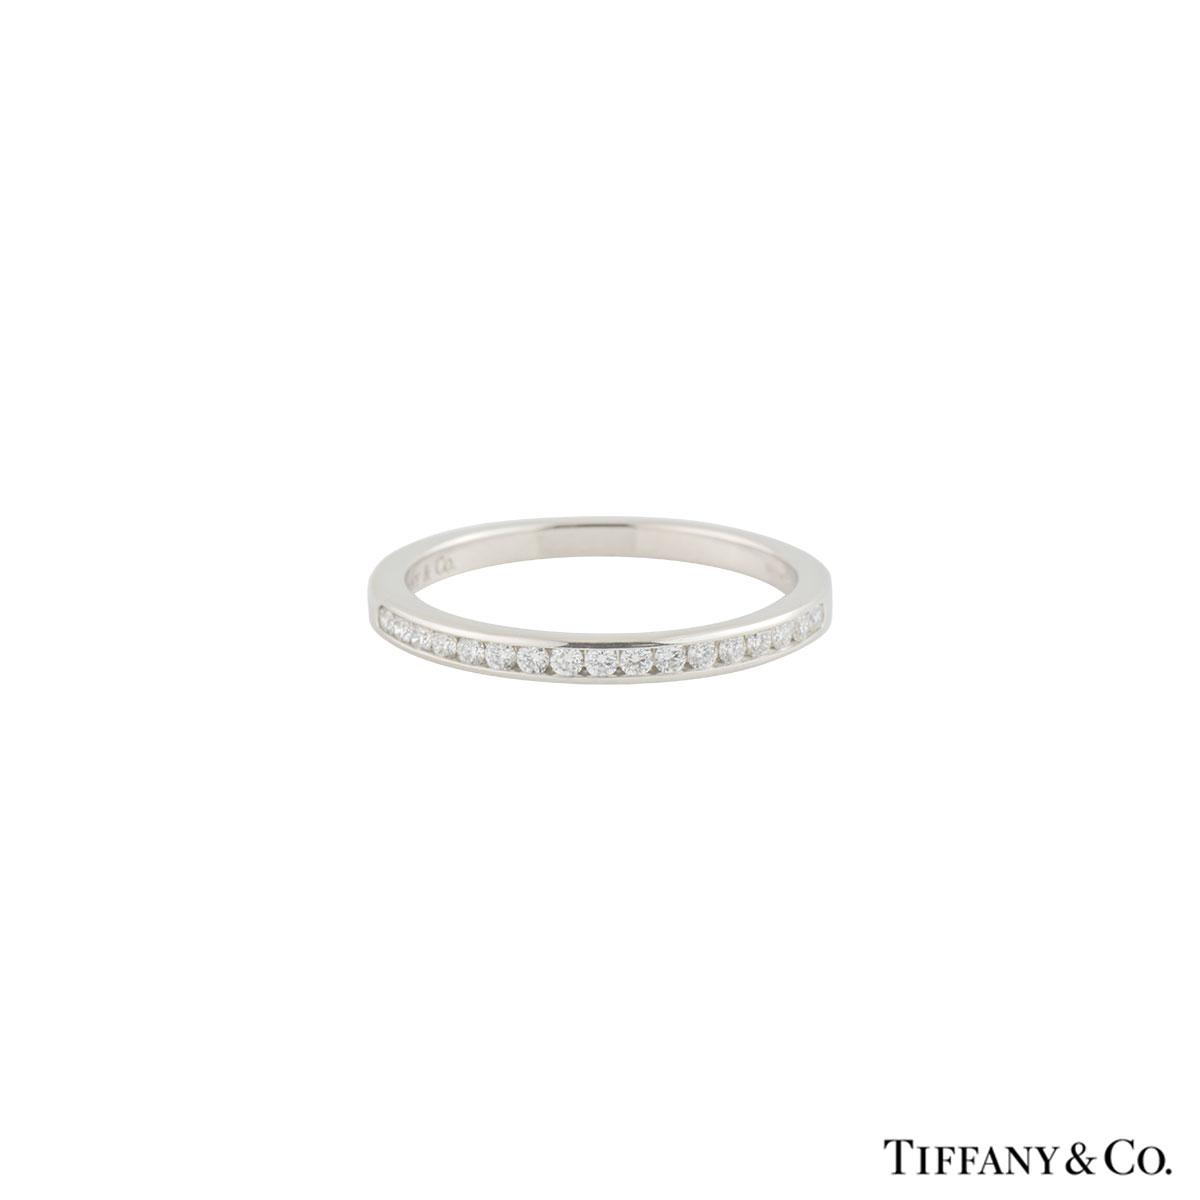 Tiffany Co Platinum Lucida 2mm Wedding Band Ring Sz 8: Tiffany & Co. Diamond Wedding Band